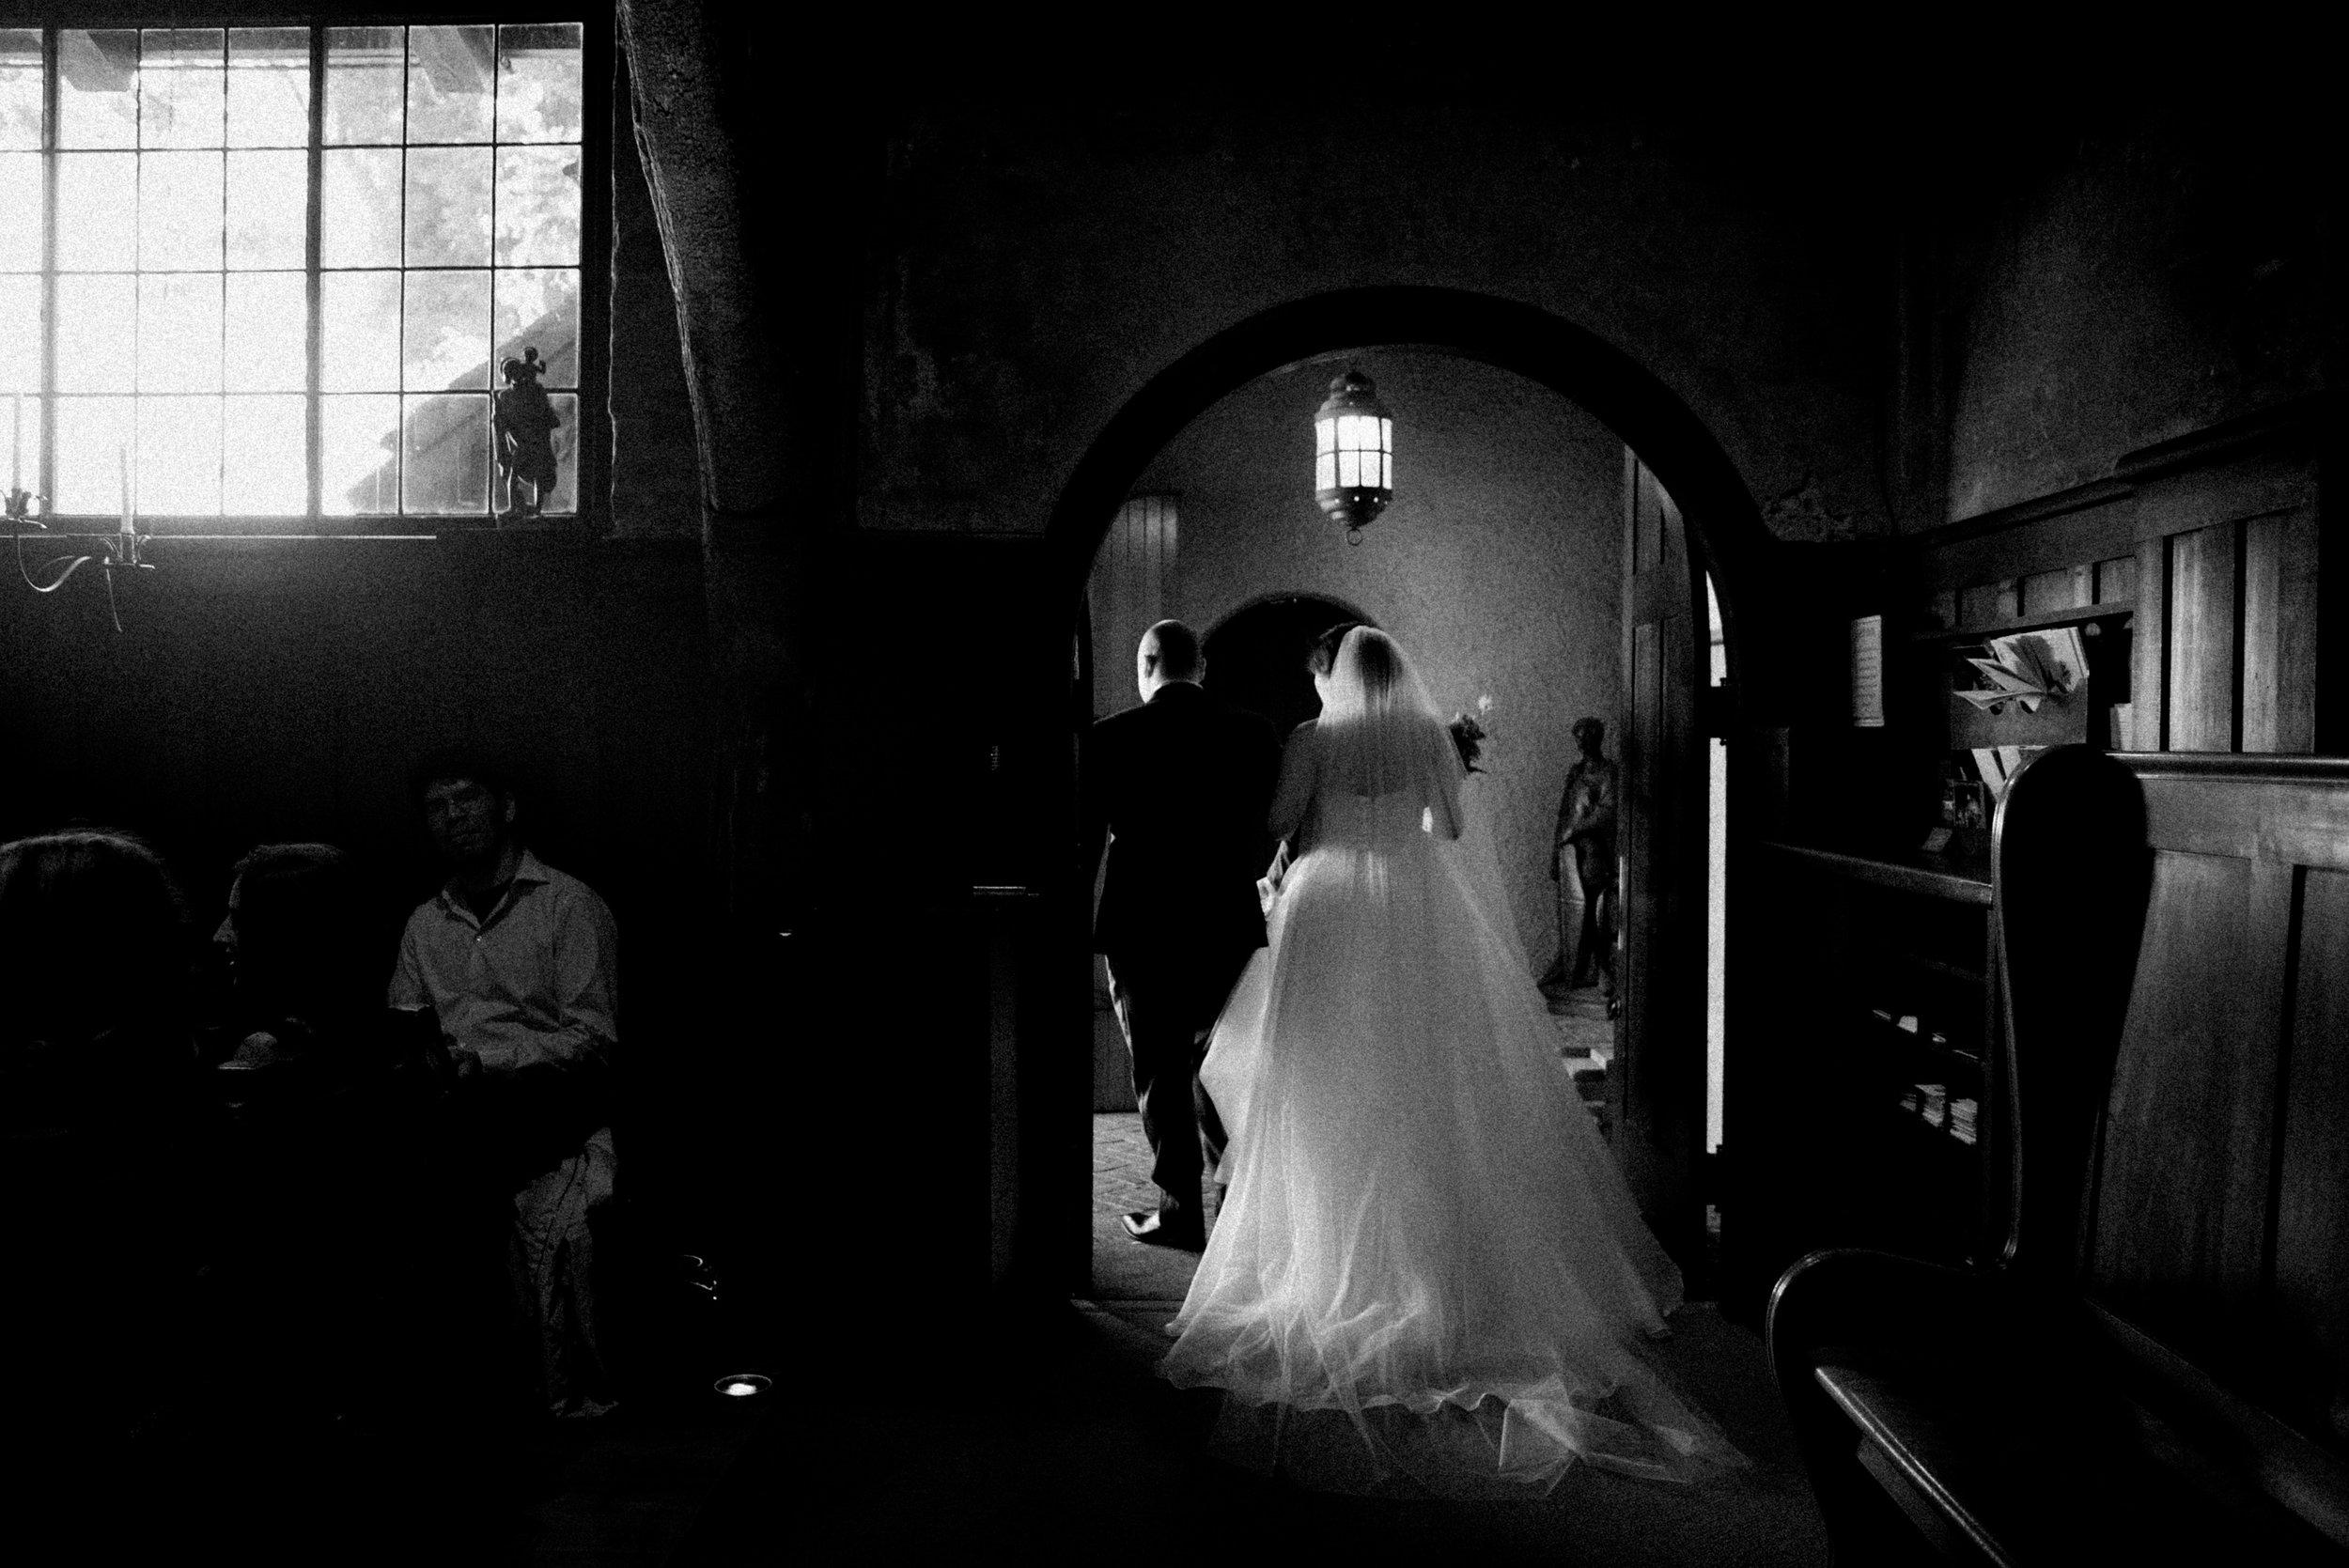 Swedenborgian Church Dogpatch Winery Wedding033.jpg